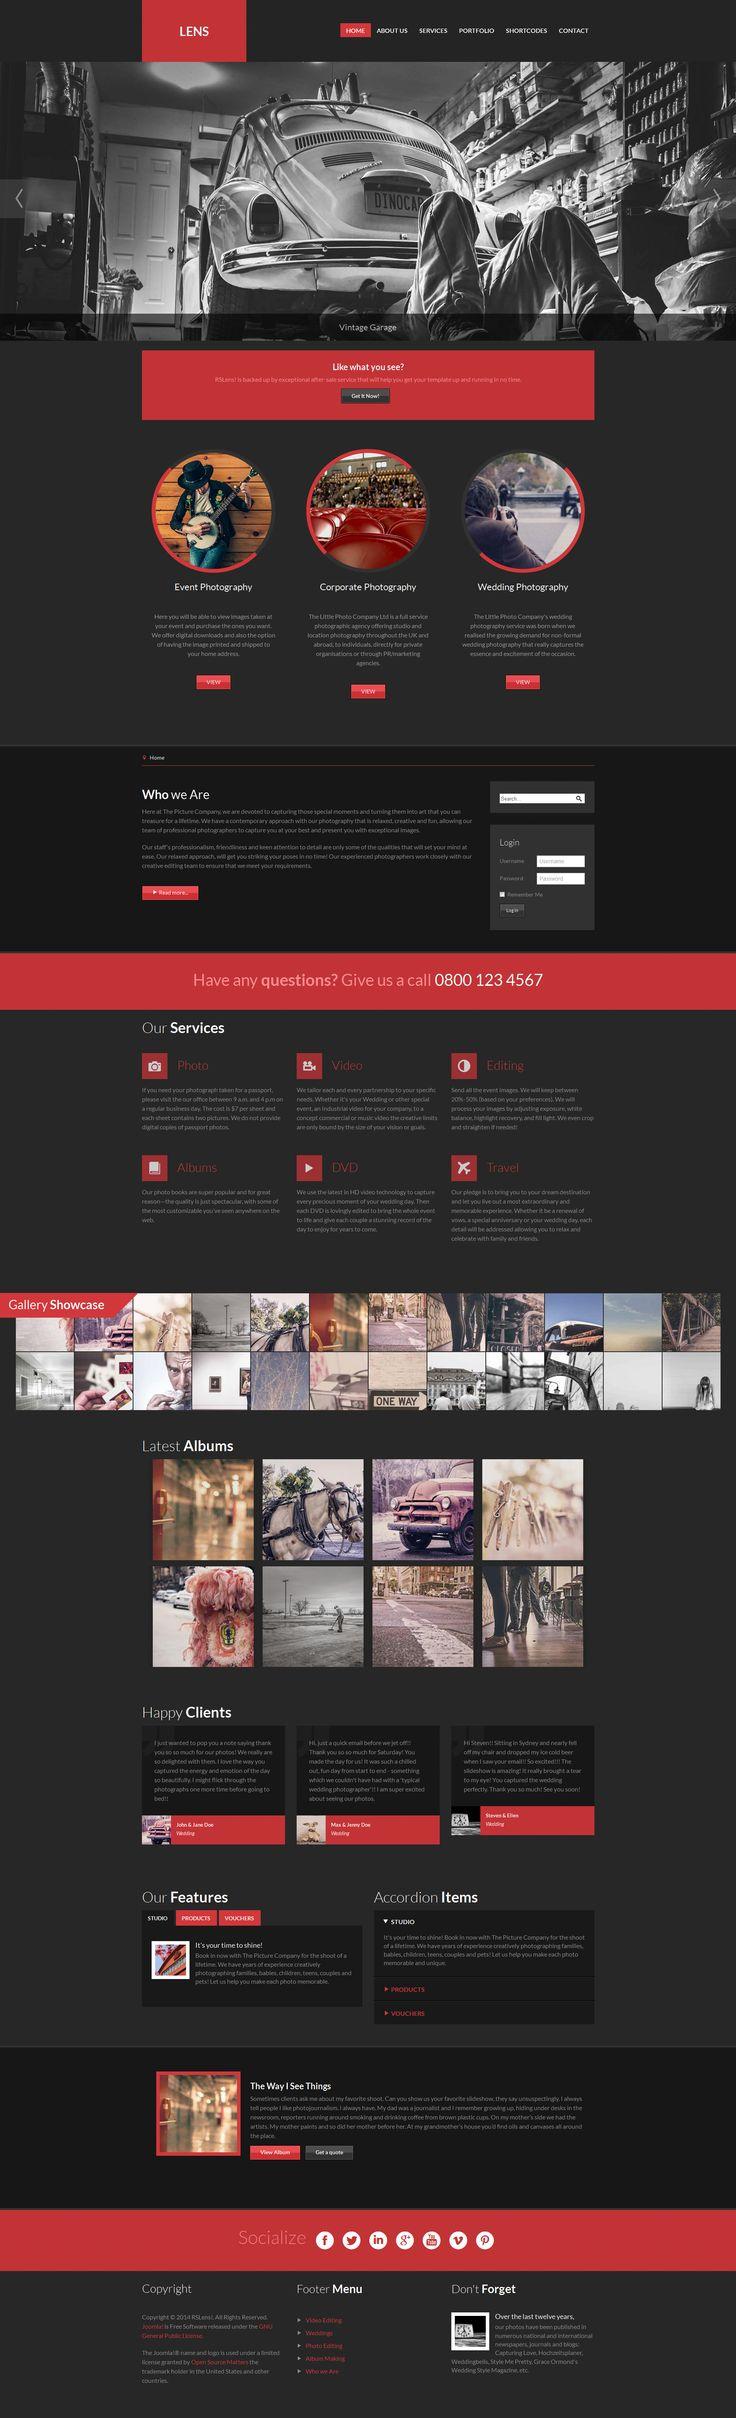 RSLens! template - a focus on showcasing photos